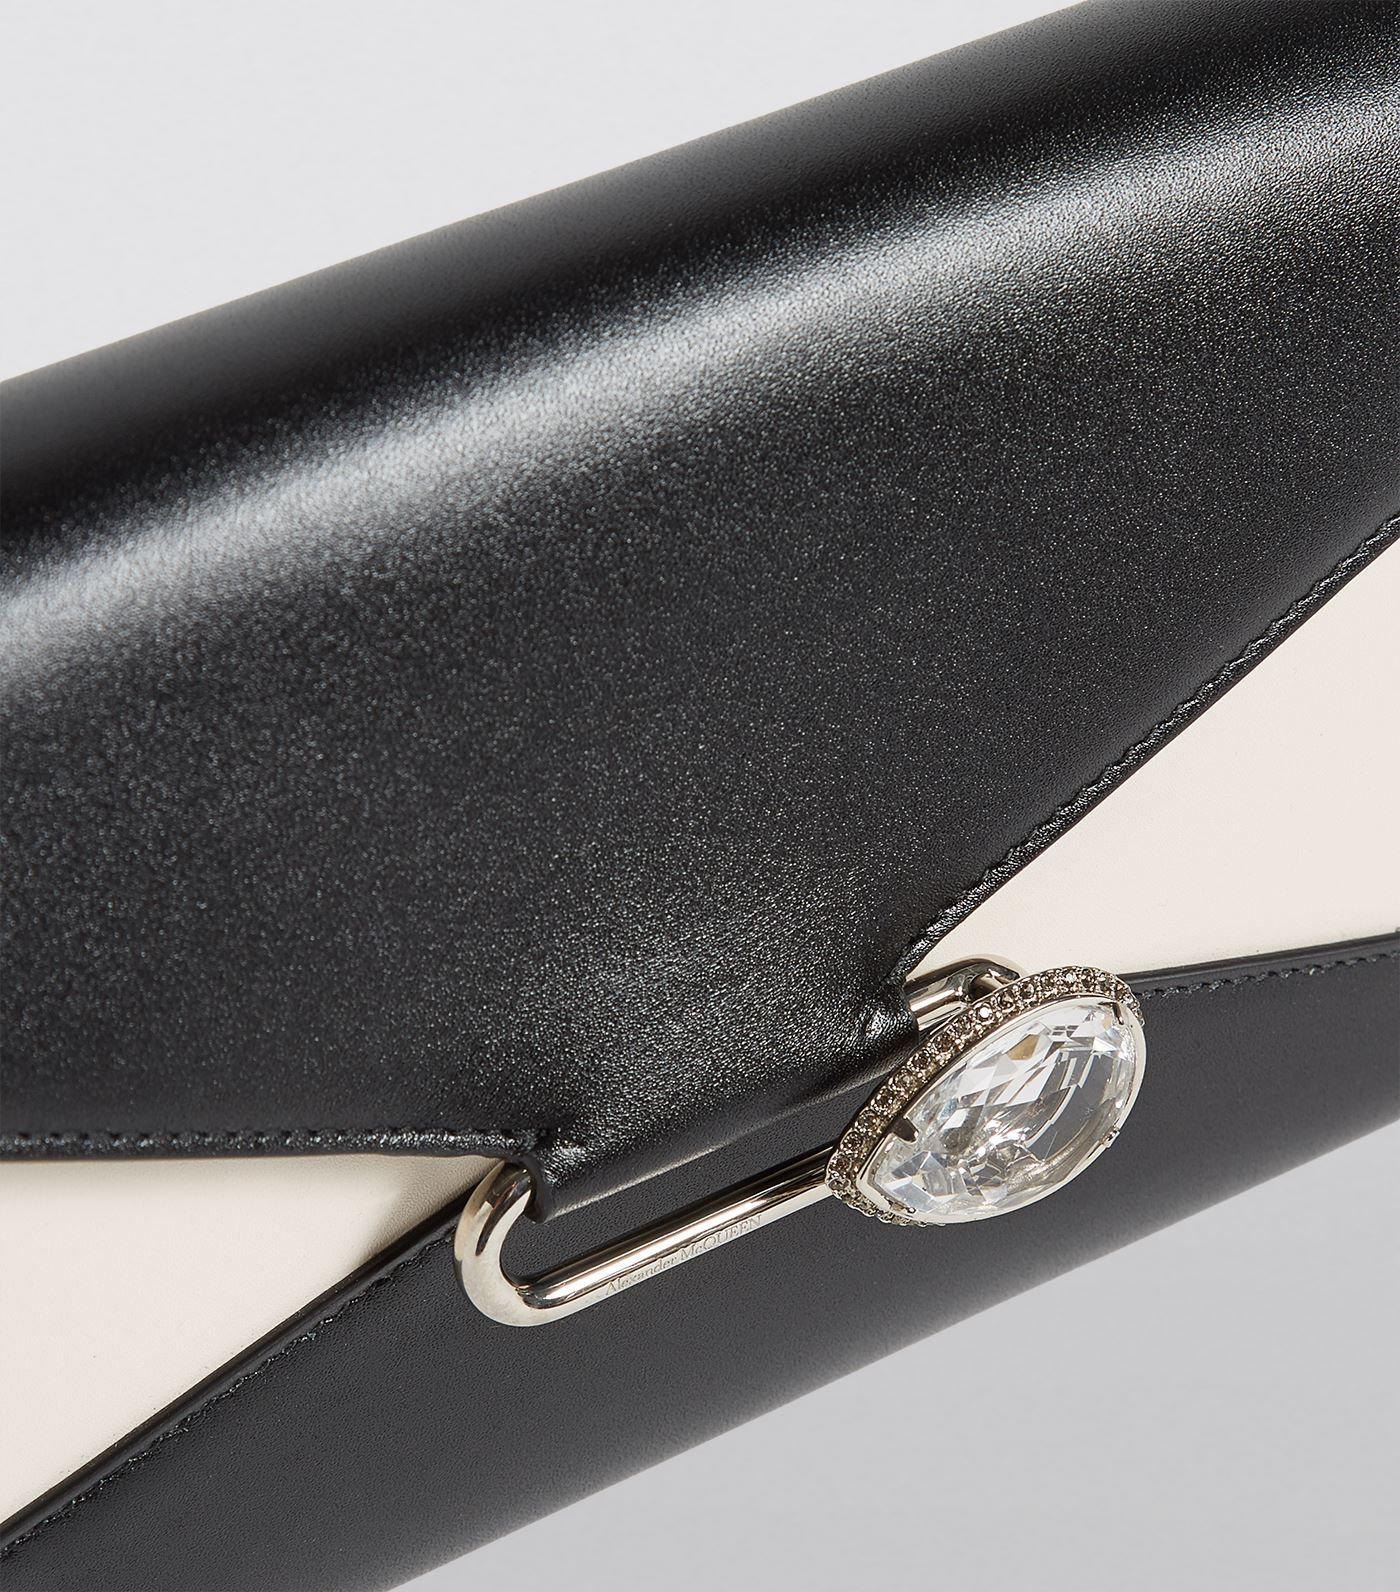 479eb8c52457 Alexander McQueen Leather Pin Wallet Bag #AD , #Sponsored, #Leather, # McQueen, #Alexander, #Bag, #Wallet